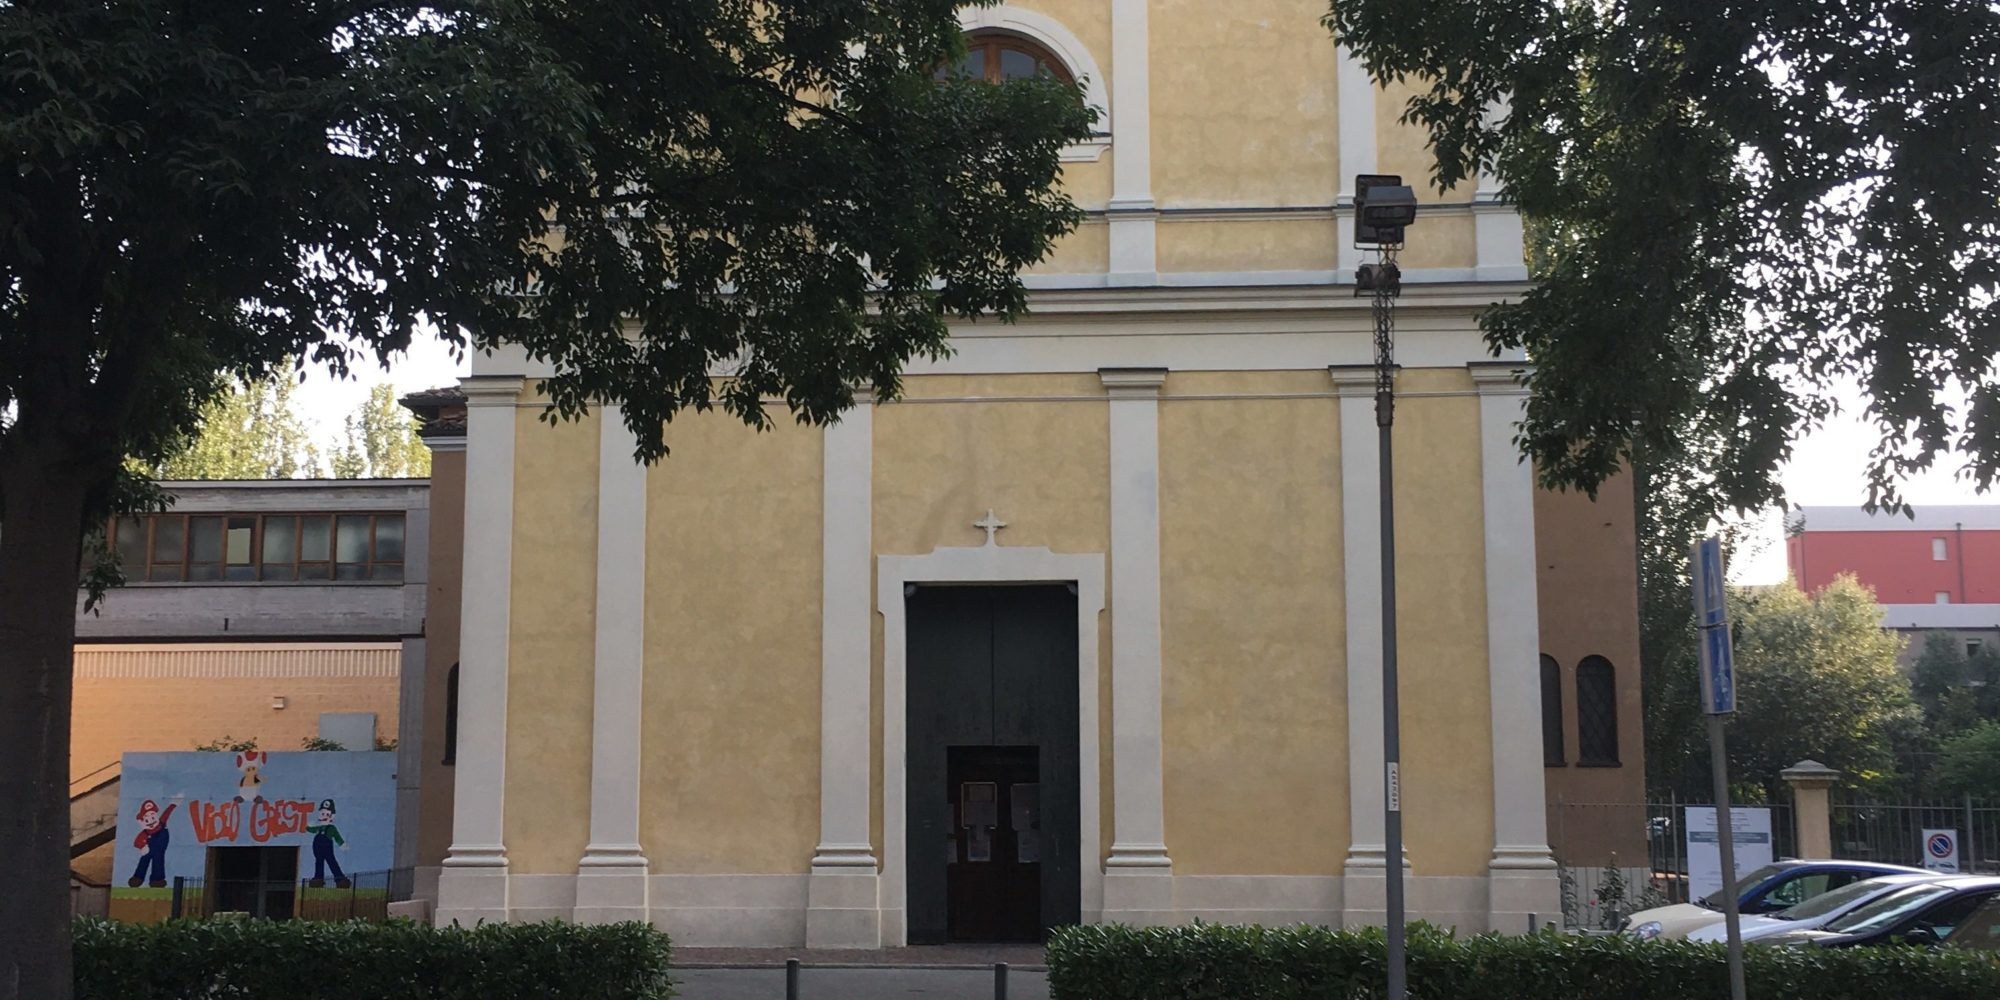 San Francesco di Paola (Ospizio)